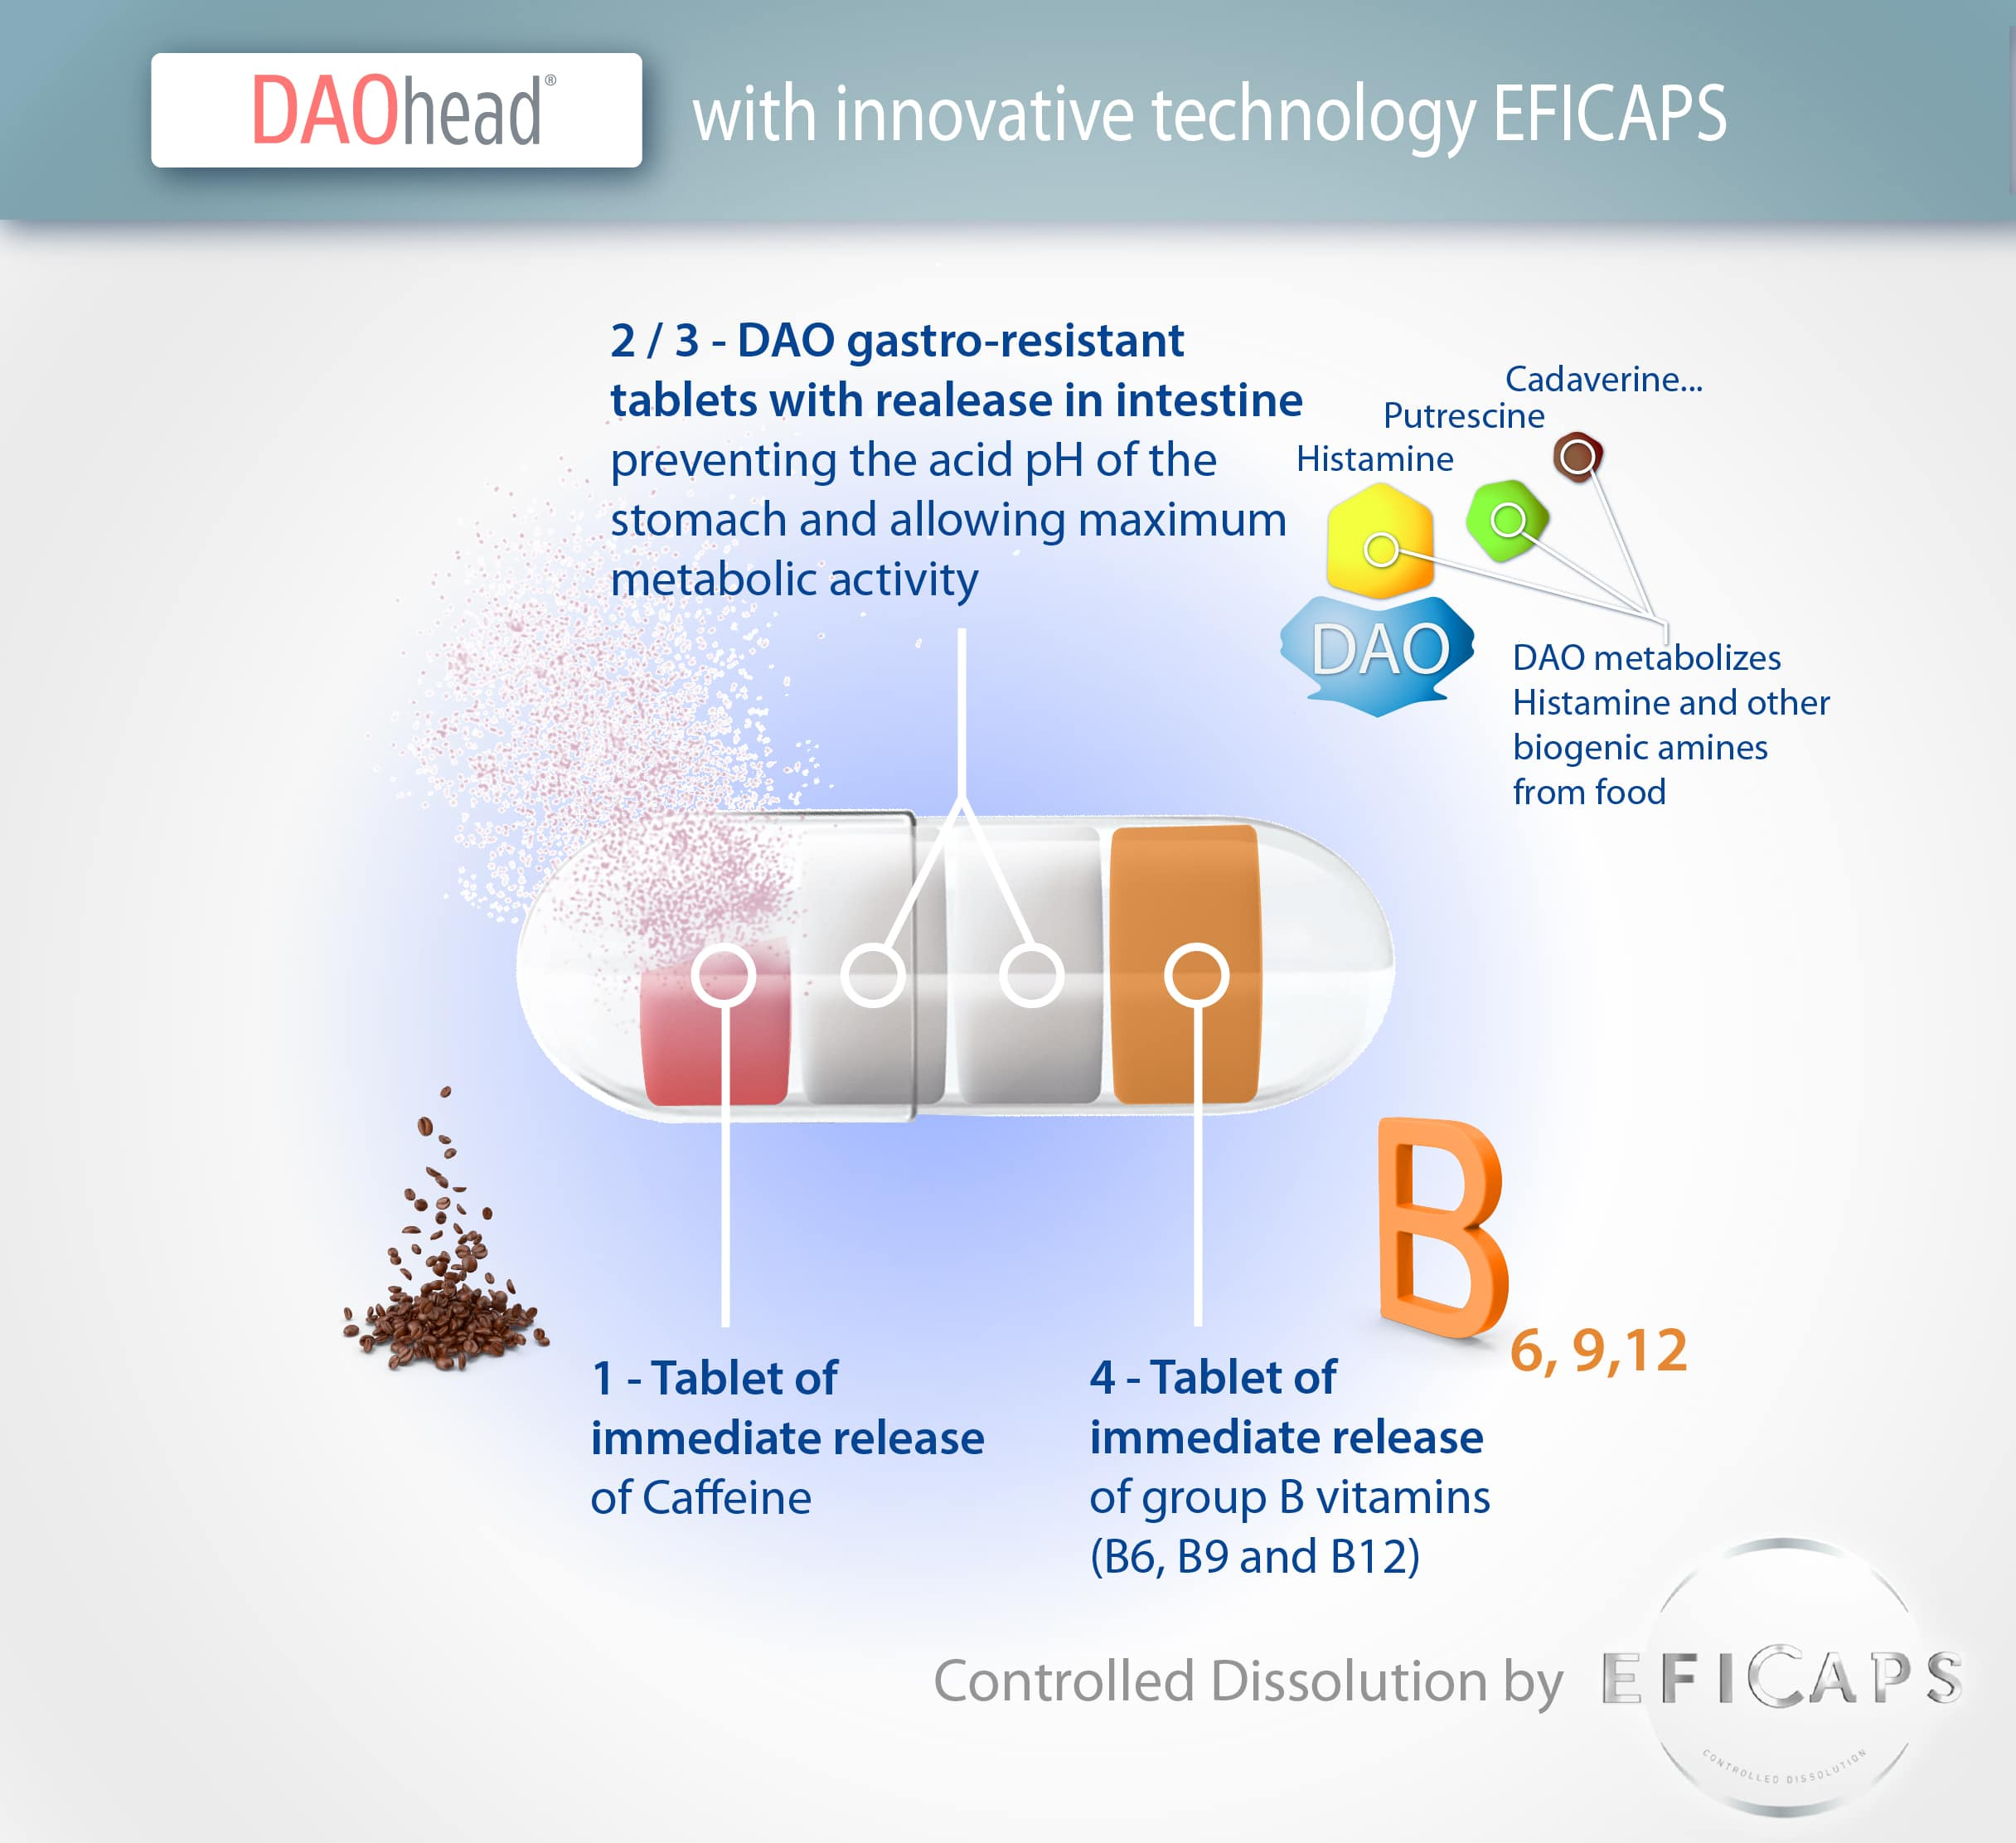 3.-Eficaps-DAOhead